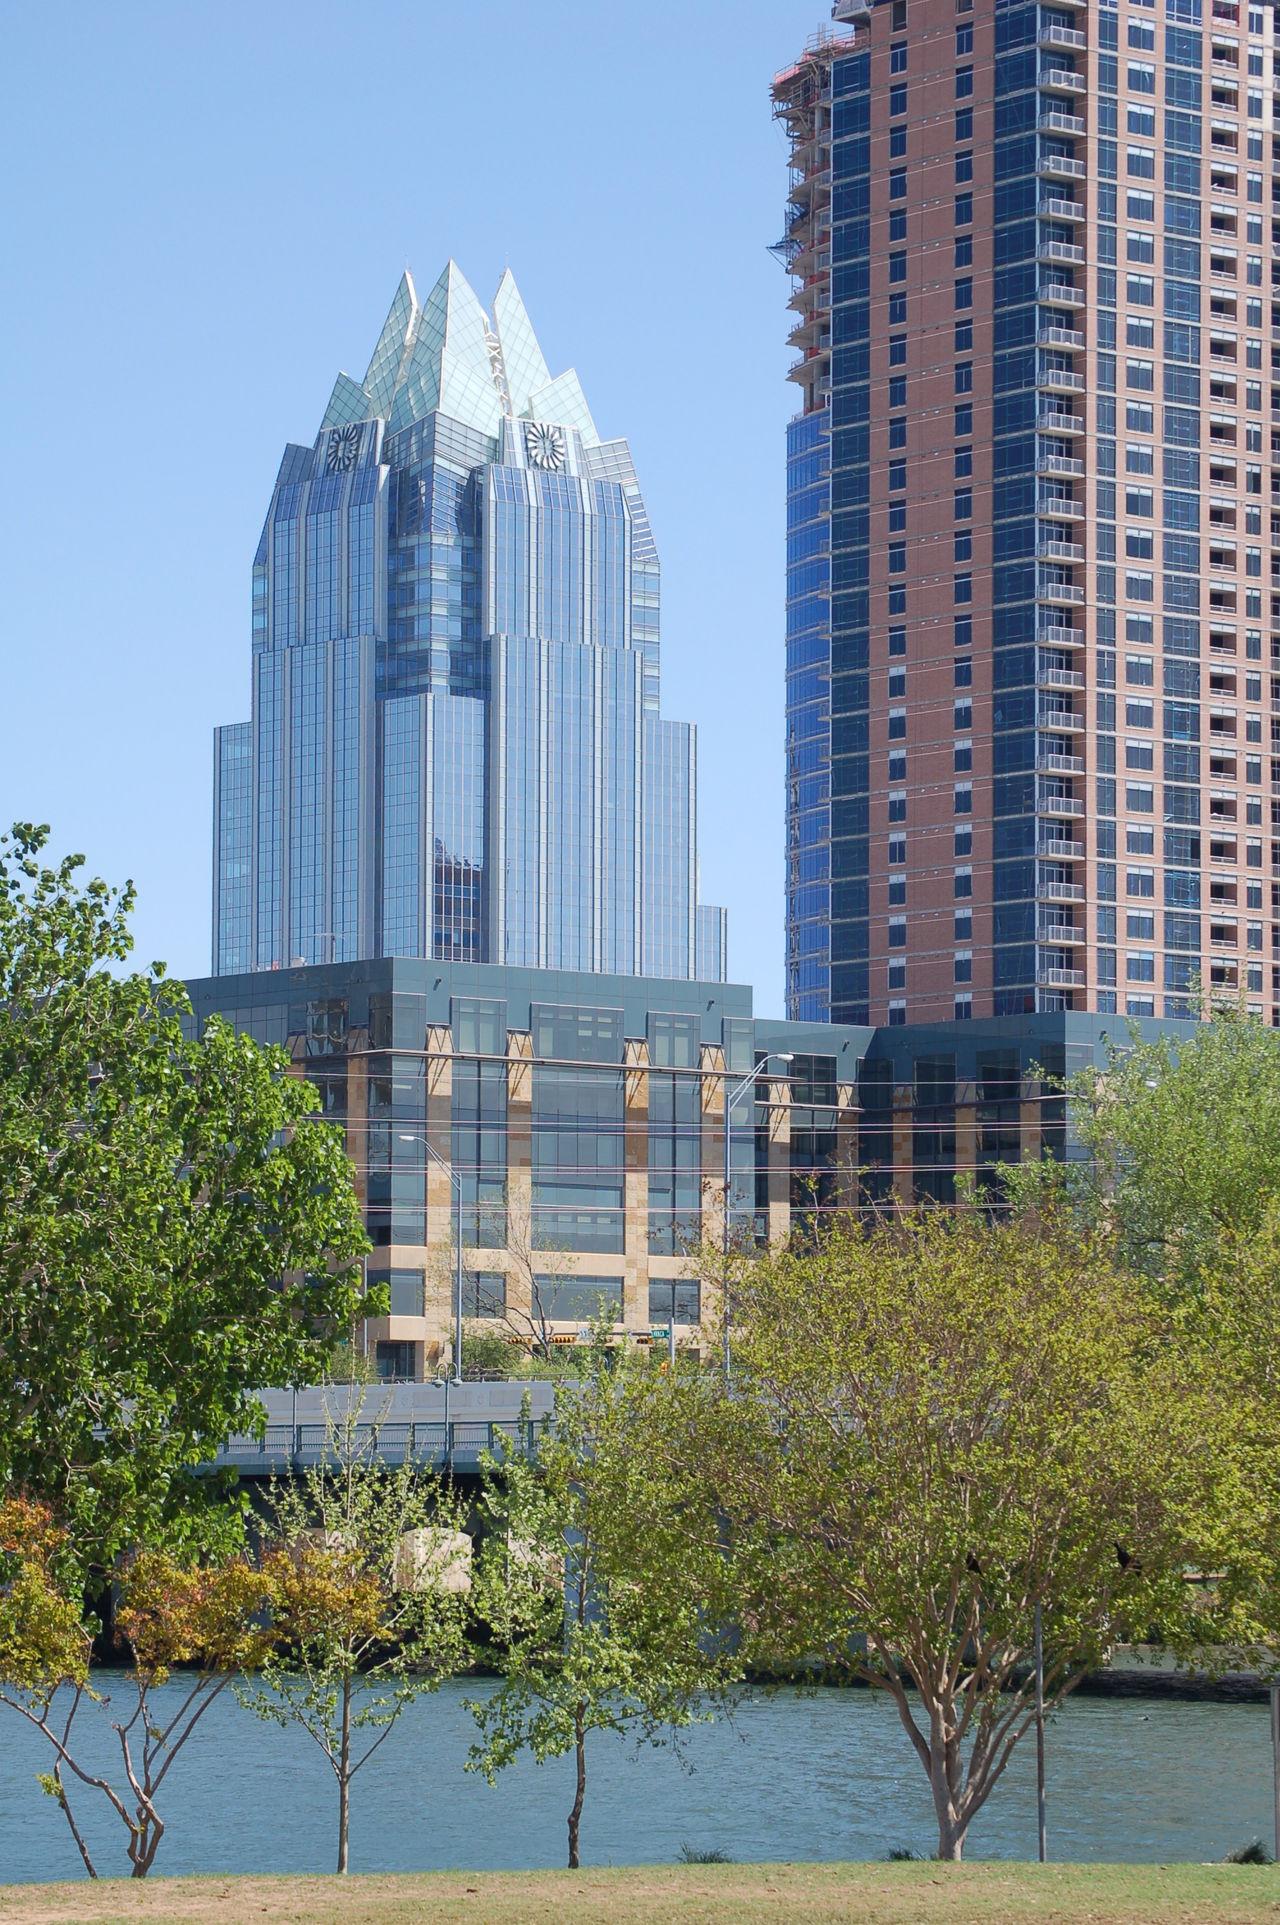 Beautiful stock photos of eule, Architecture, Austin, Building Exterior, Built Structure